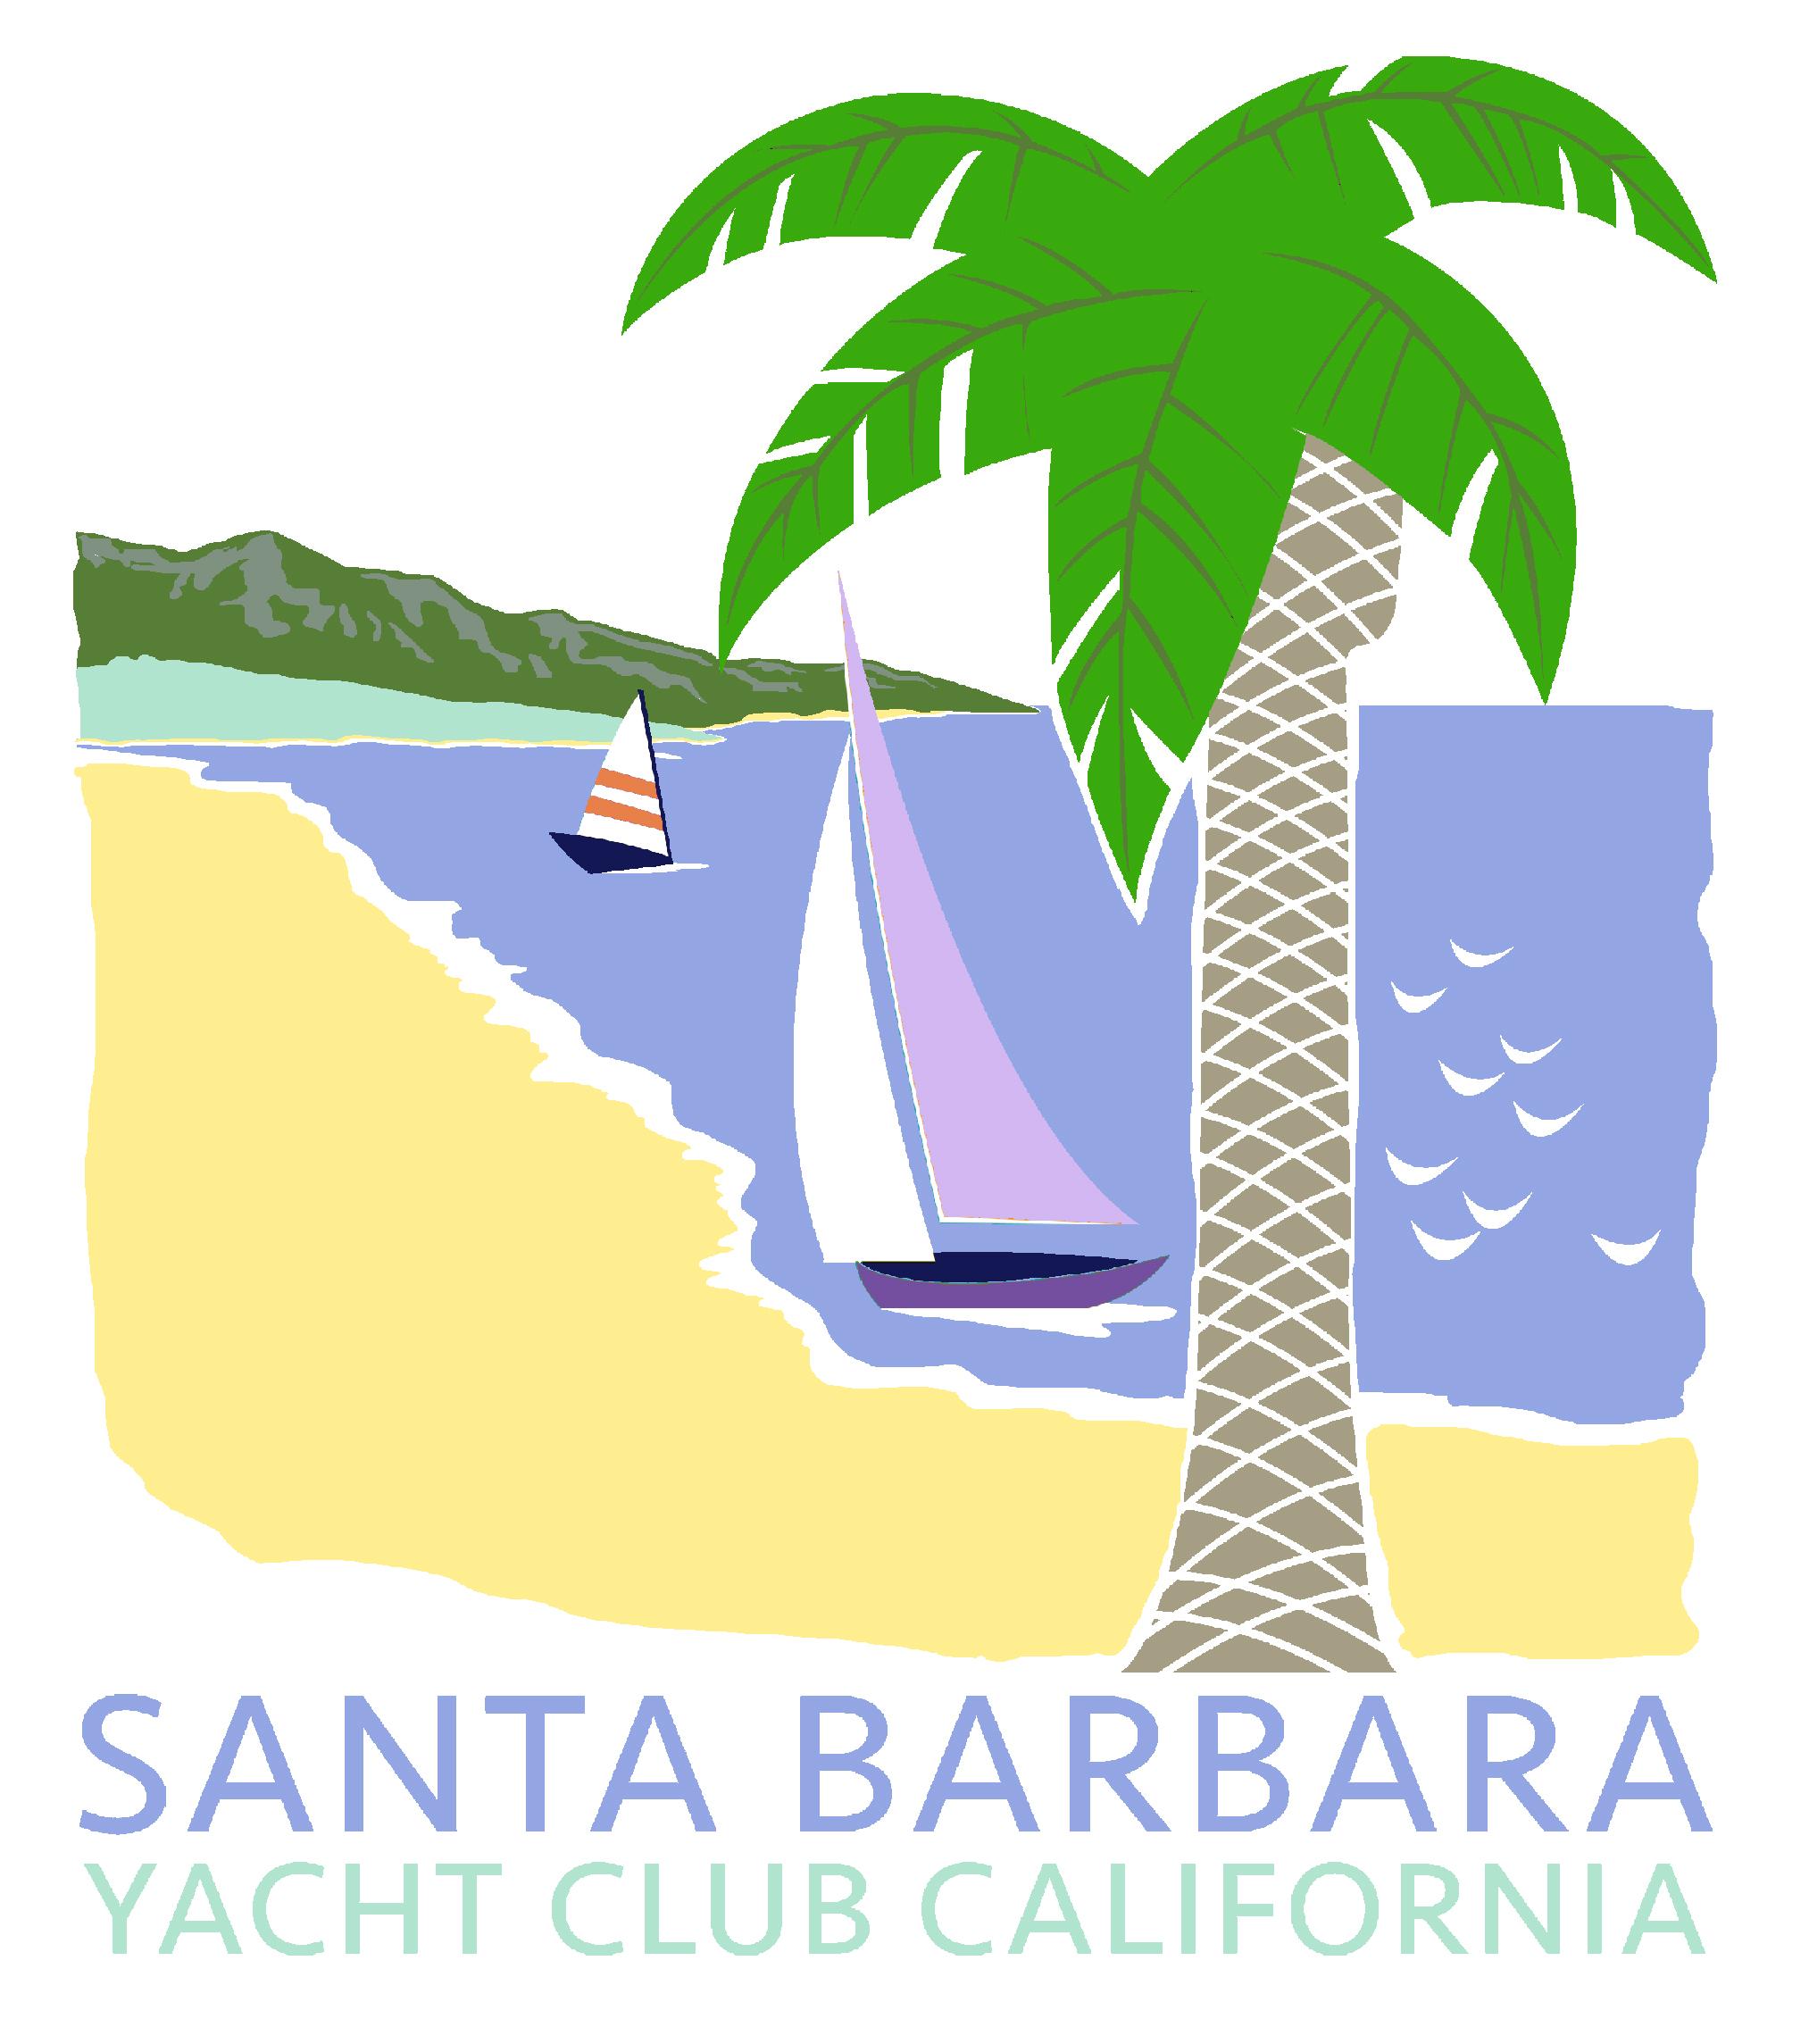 SANTA BARBARA _flat.jpg